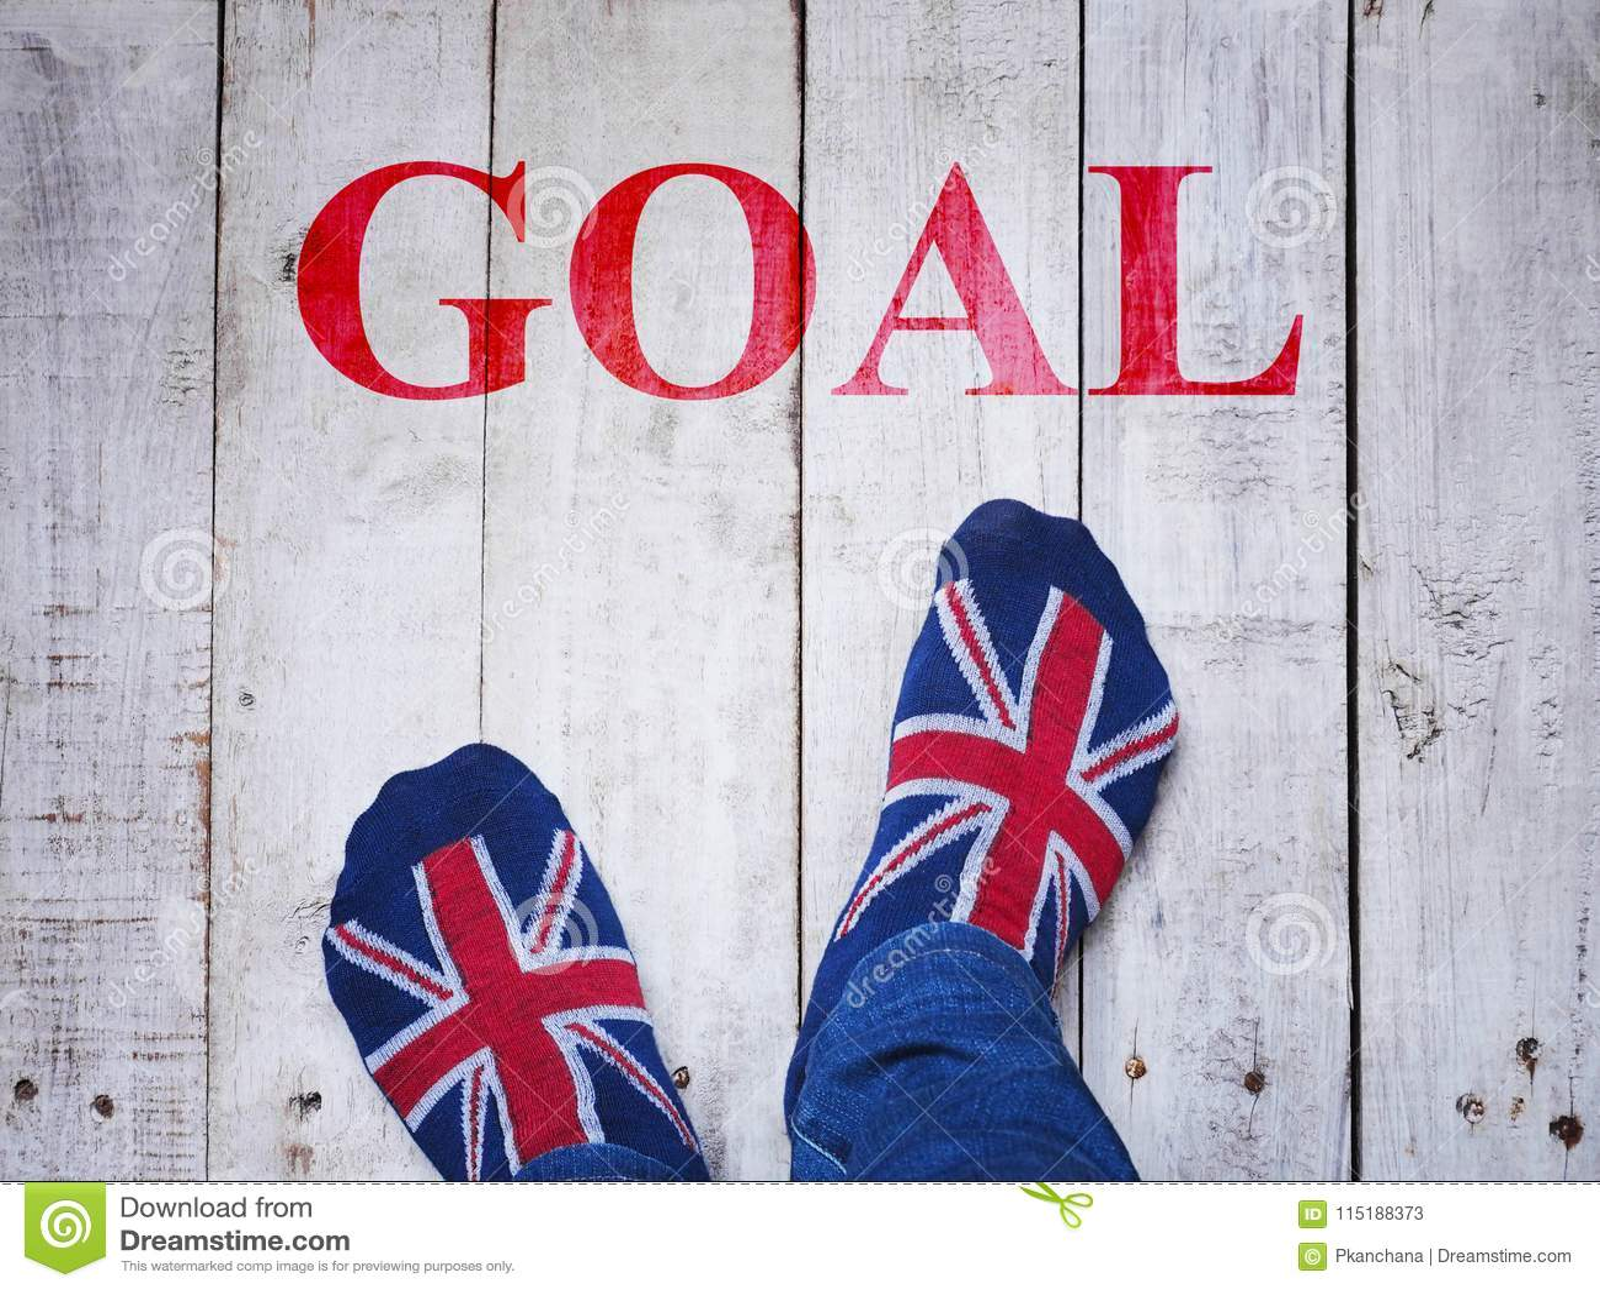 Selfie feet wearing socks with British flag pattern